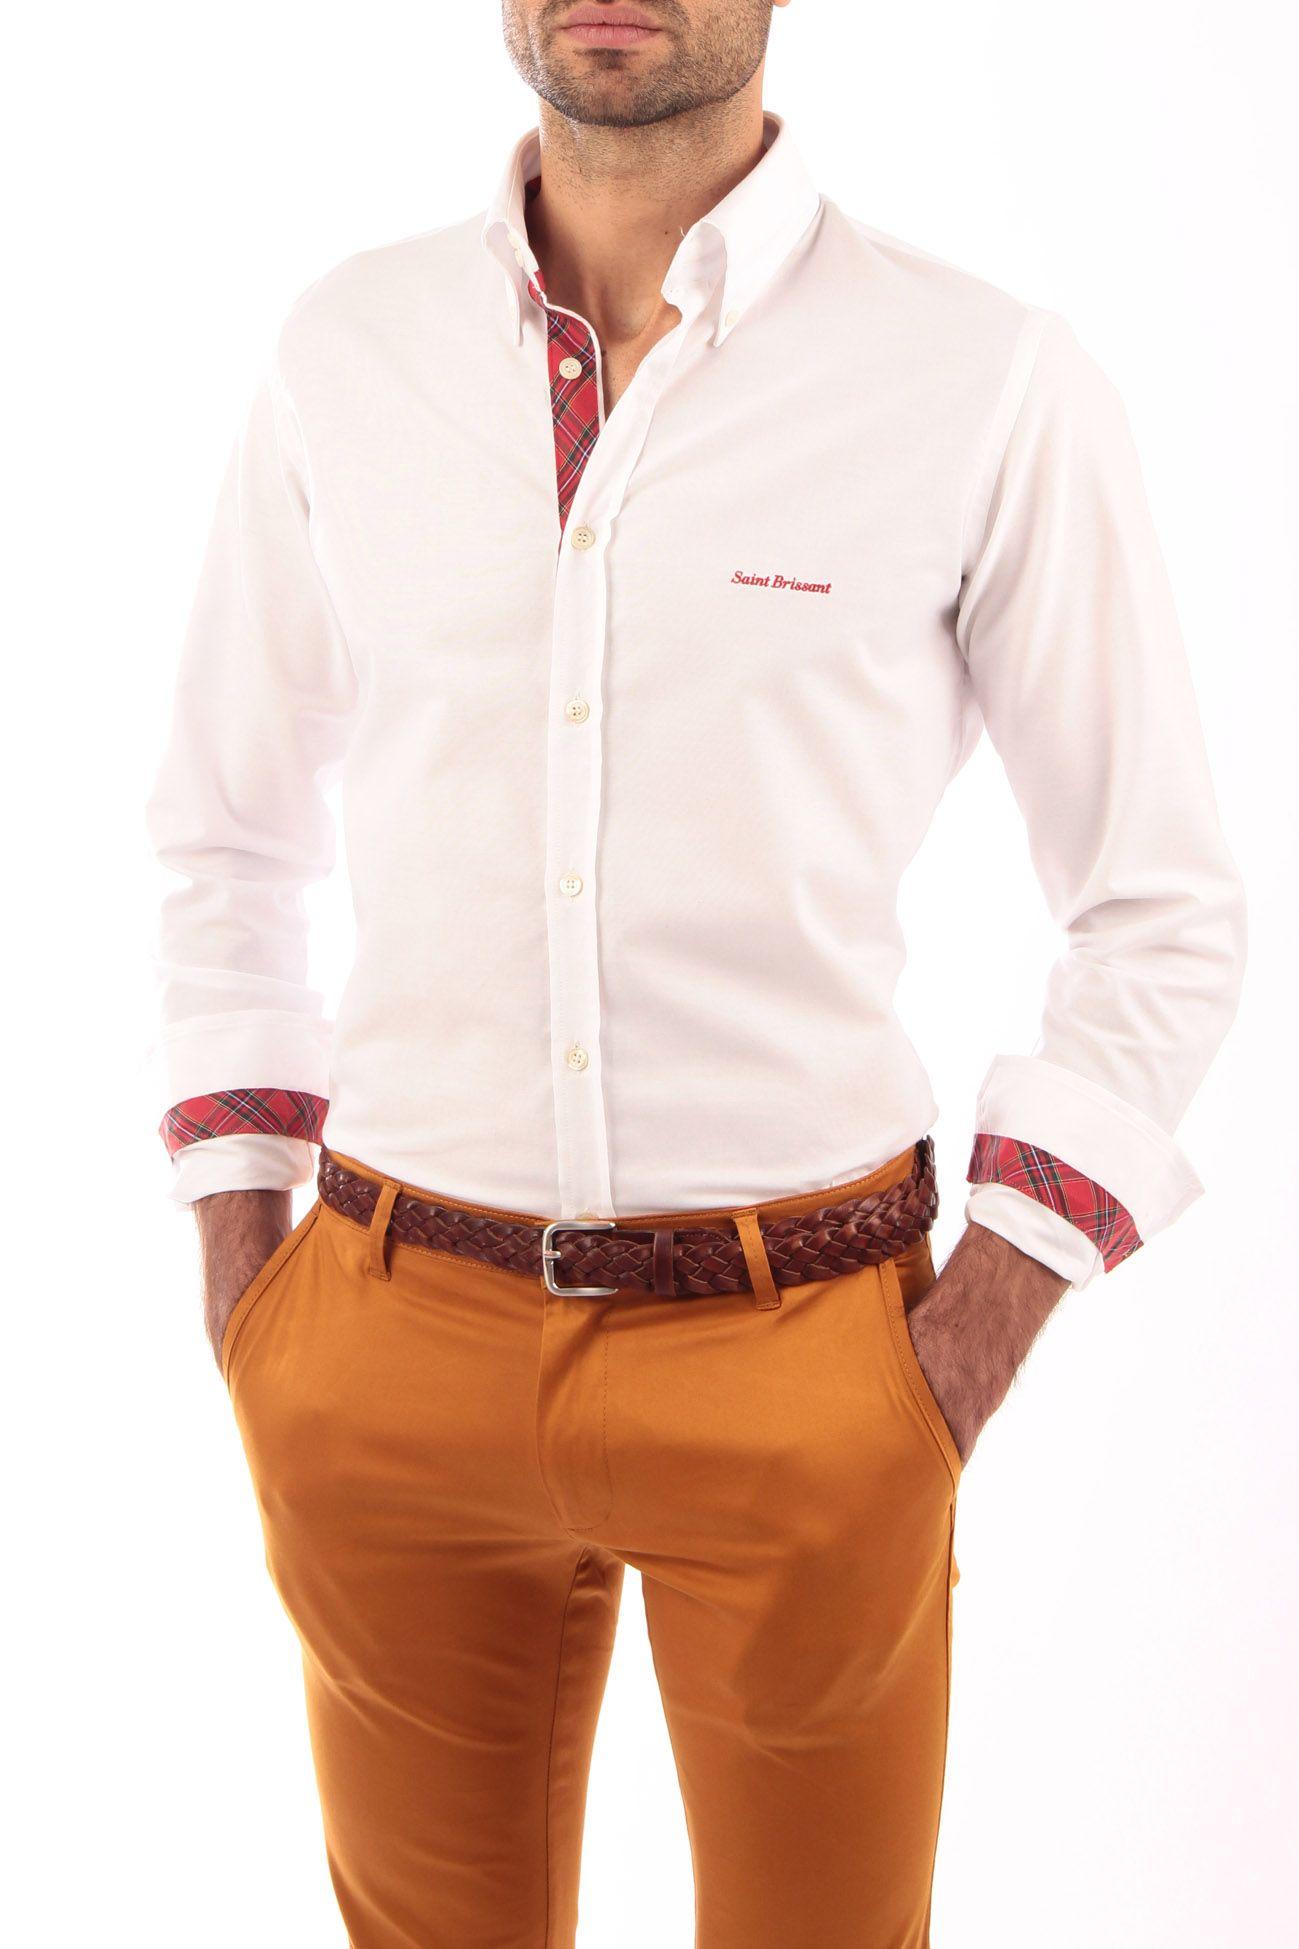 Camisa Oxford blanca con cinta escocesa roja. Detalles de cinta escocesa en vista de botones, interior de puños e interior del cuello. Detalle de bordado en pecho e interior de canesú. Fabricado en España. 100% artesanal.